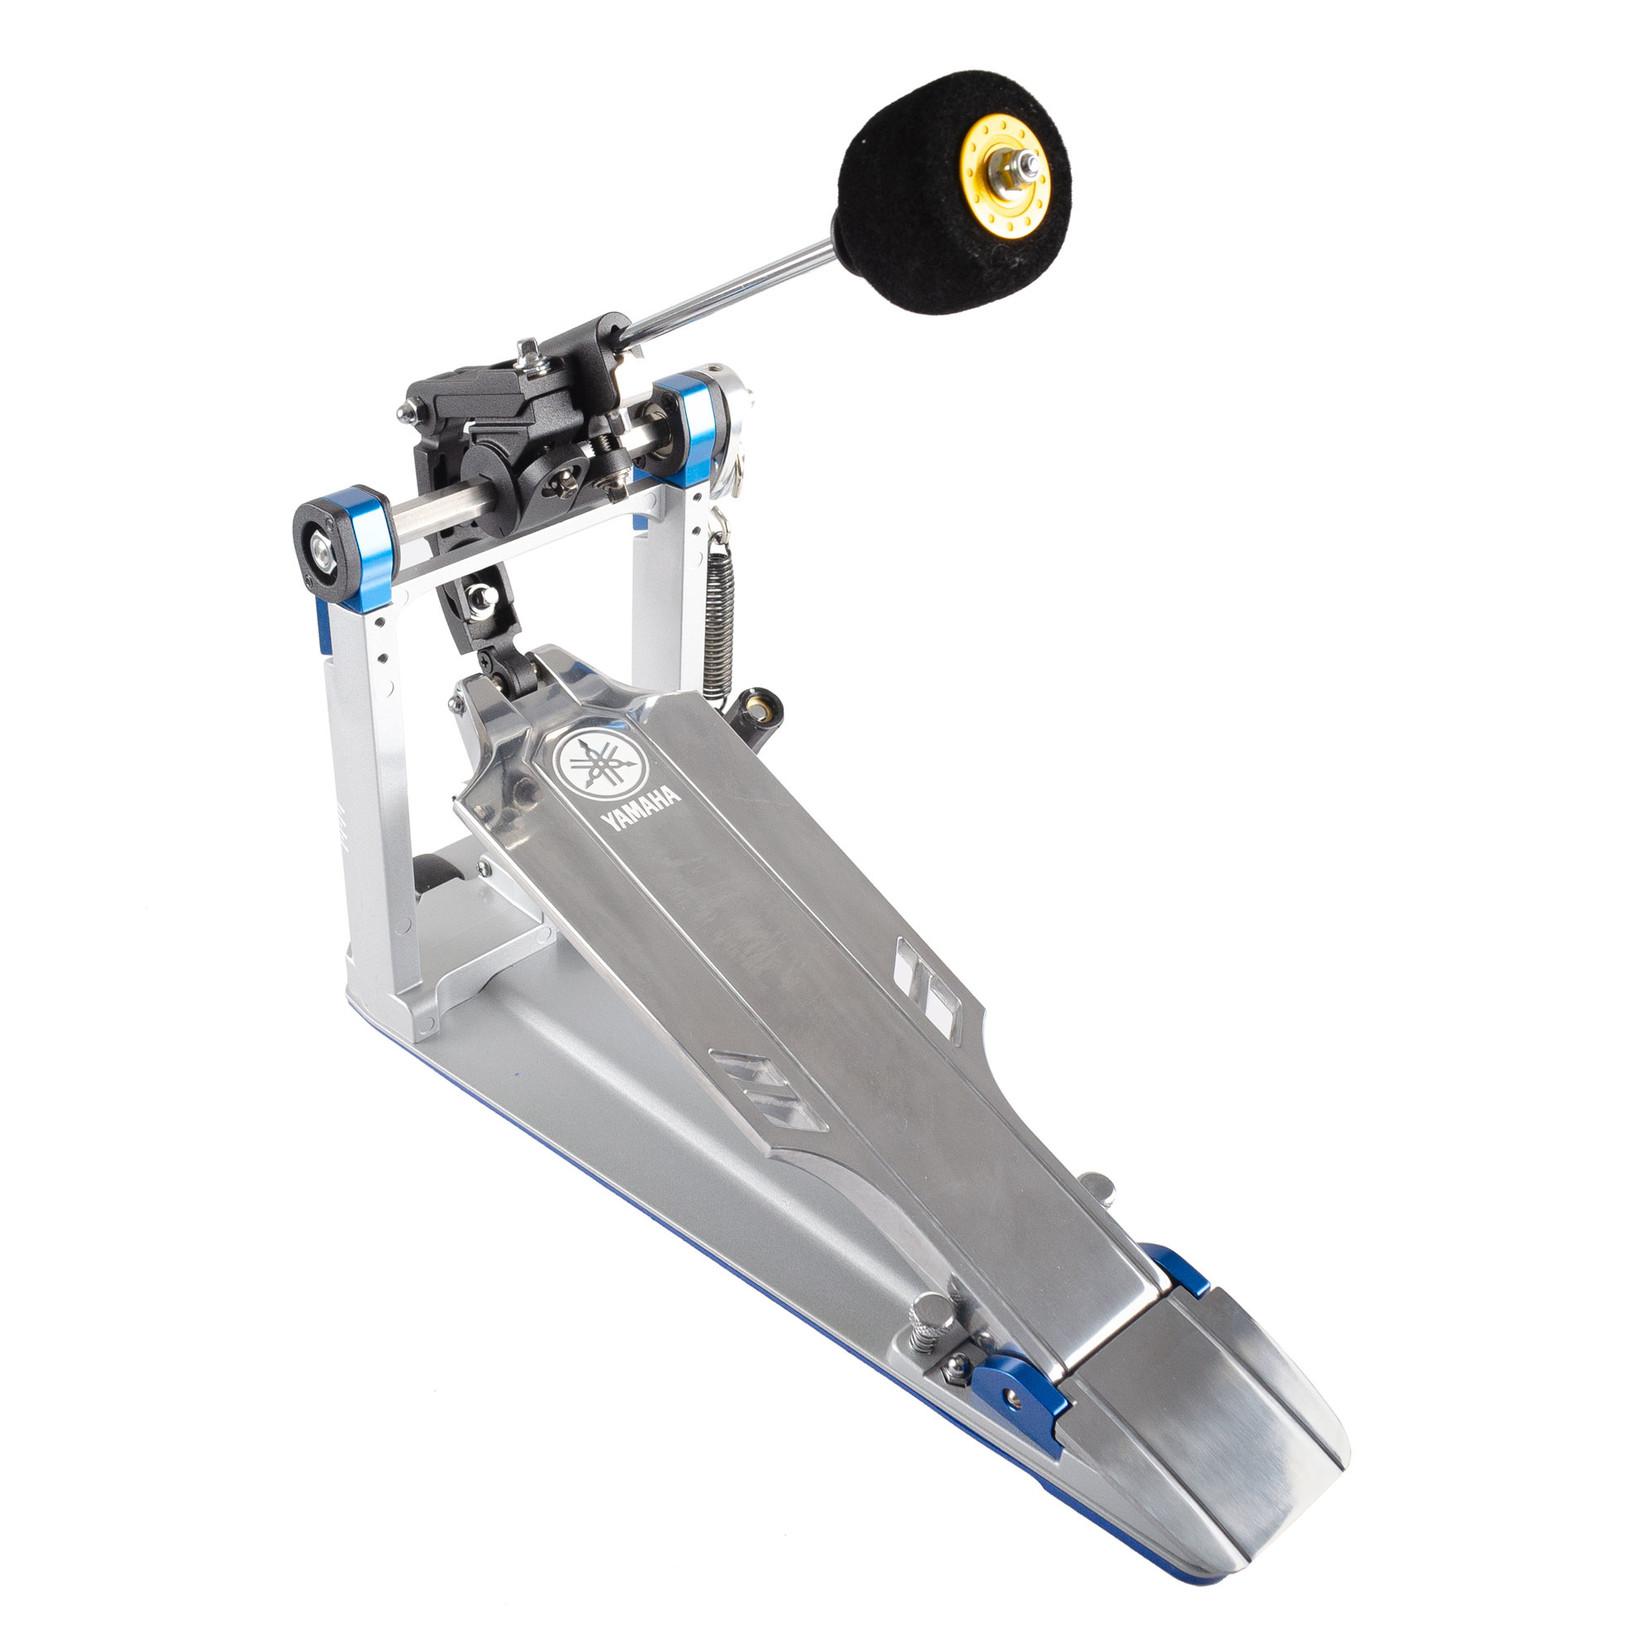 Yamaha Yamaha Single Bass Drum Pedal - Direct Drive - Long Footboard - Side Hoop Clamp